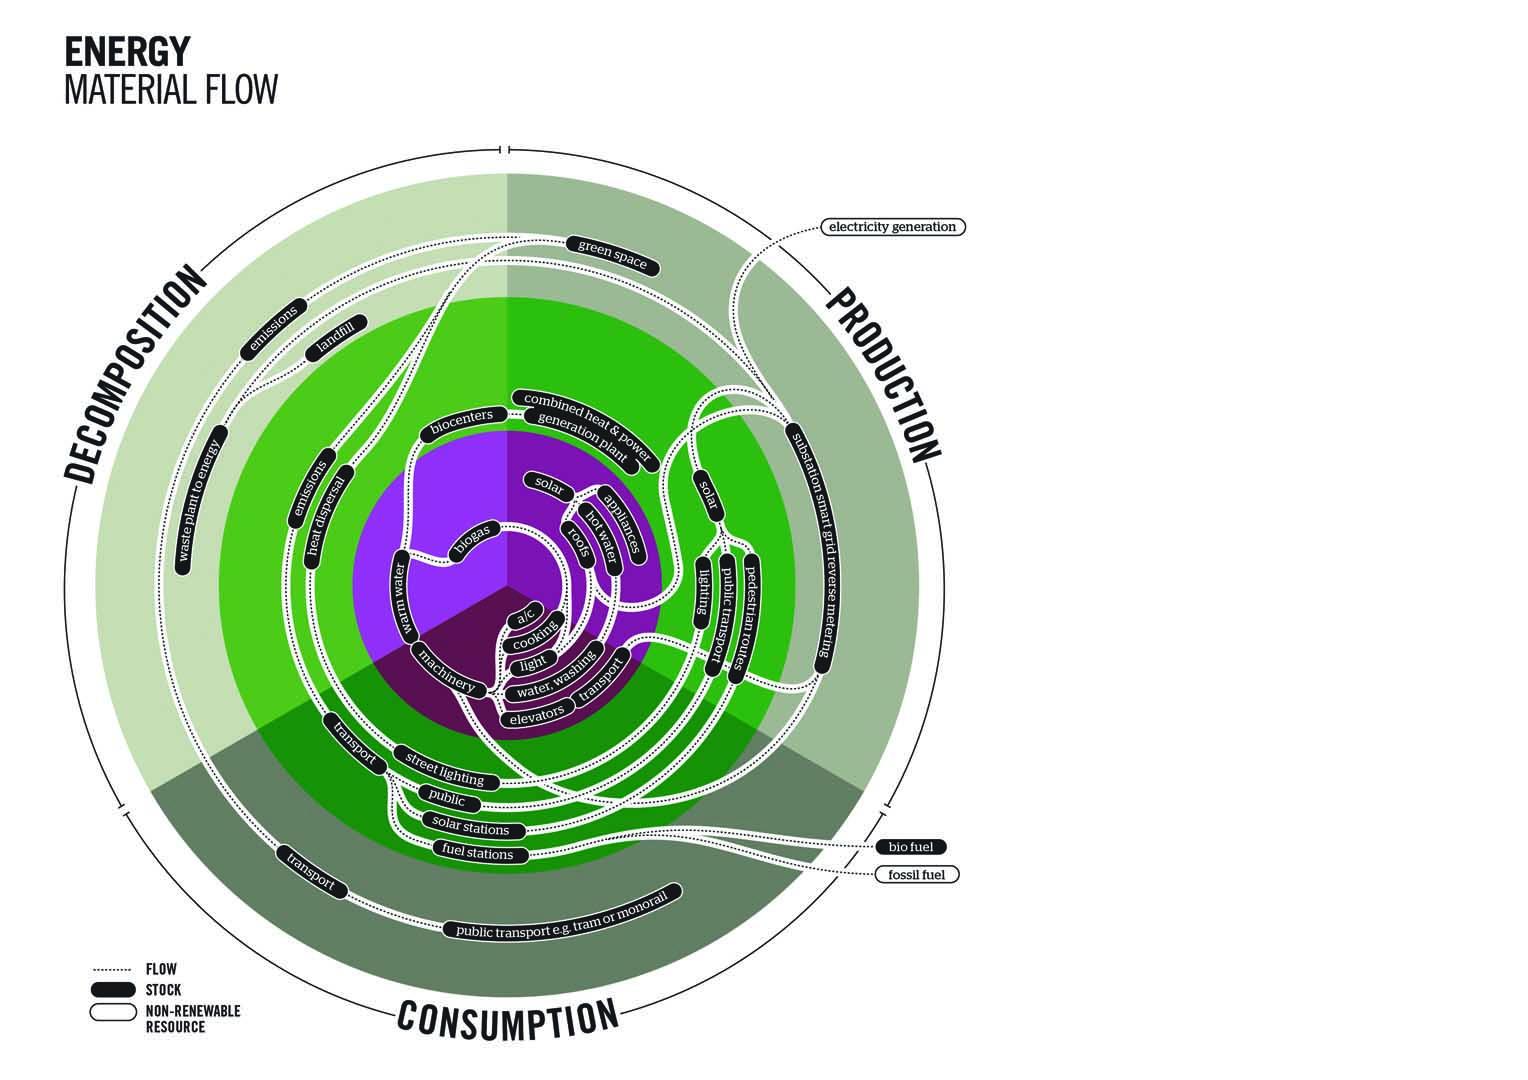 Smart-city-diagrams_Energy-Material-Flow